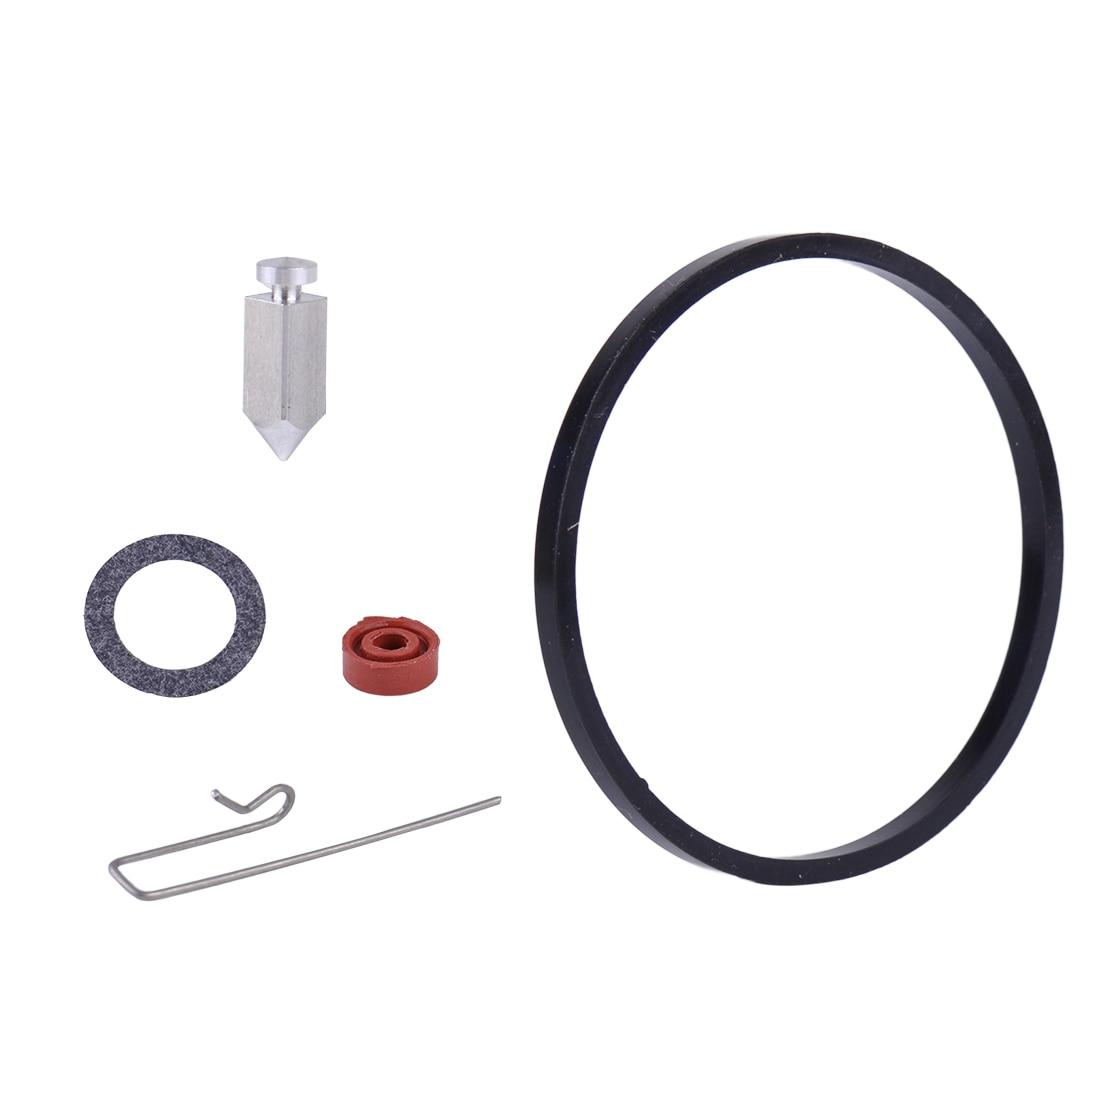 LETAOSK Inlet Needle Gasket Carburetor Carb Repair Kit Replacement Fit For Tecumseh Float Carburetor V40 V50 V60 631021 525-212